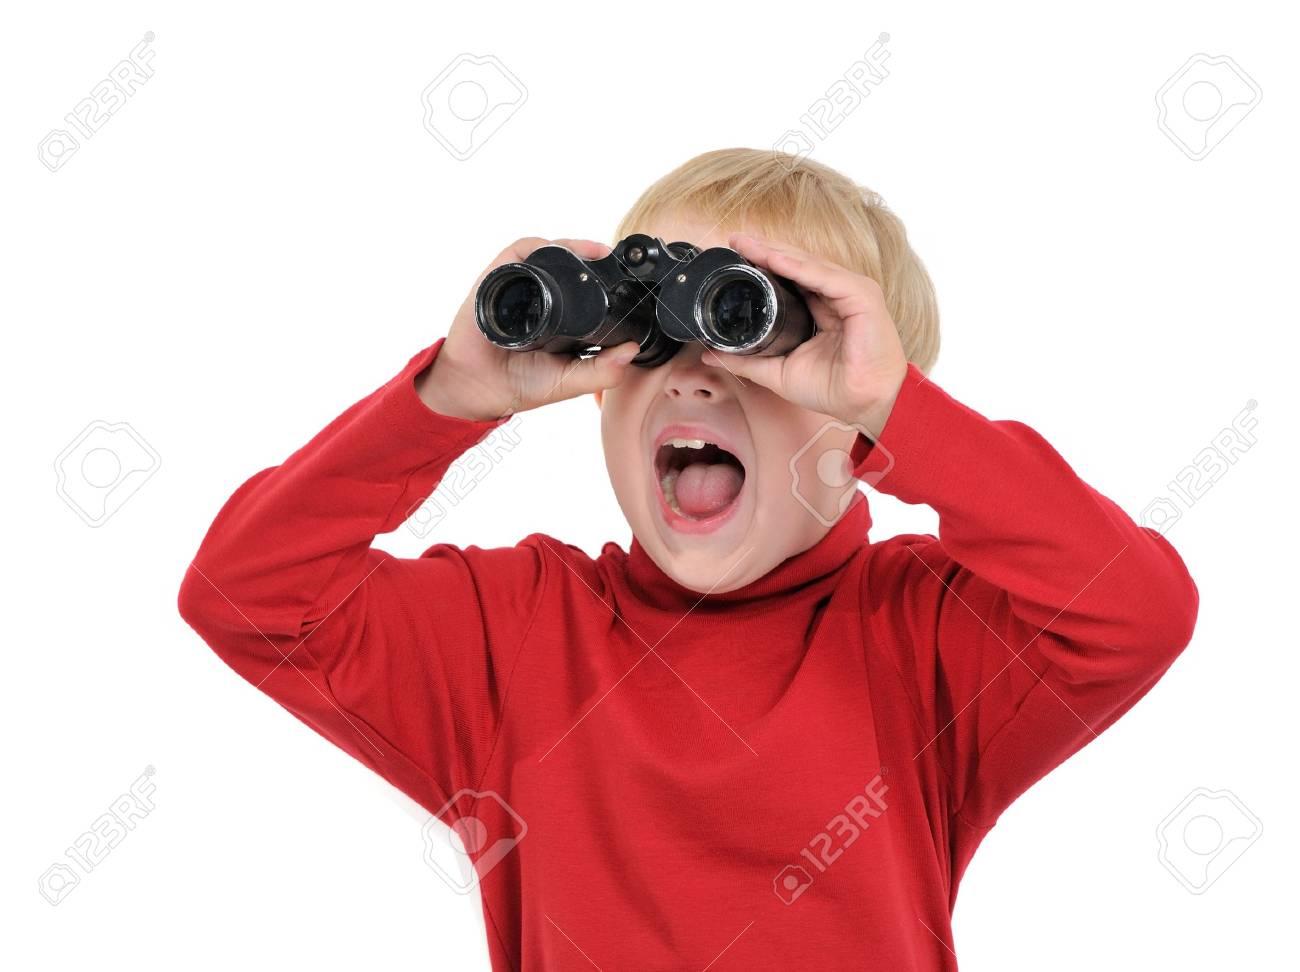 Happy boy with binoculars, isolated on white Stock Photo - 13904162